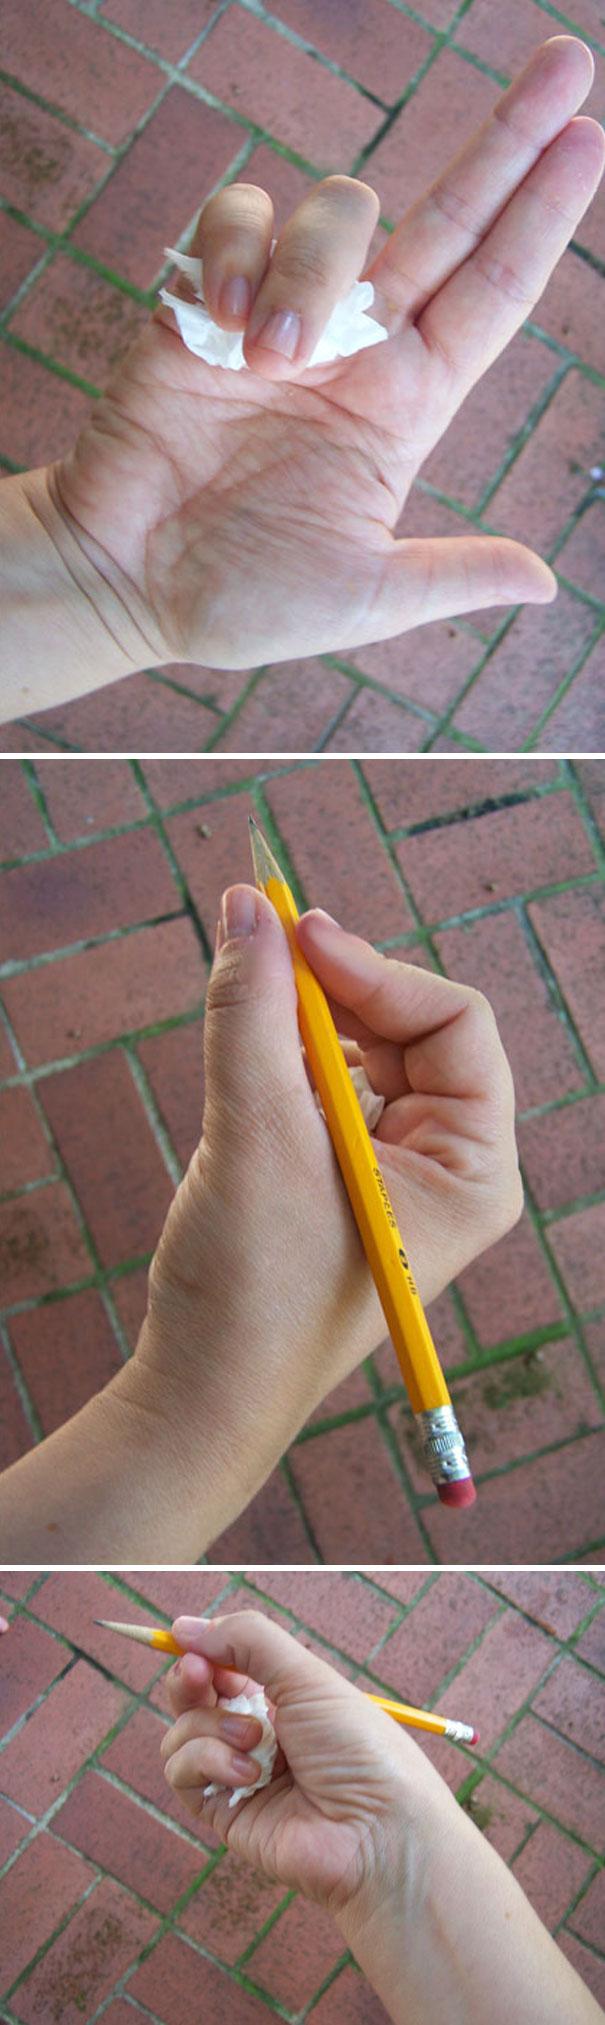 Teach A Child To Hold A Pencil Using A Kleenex